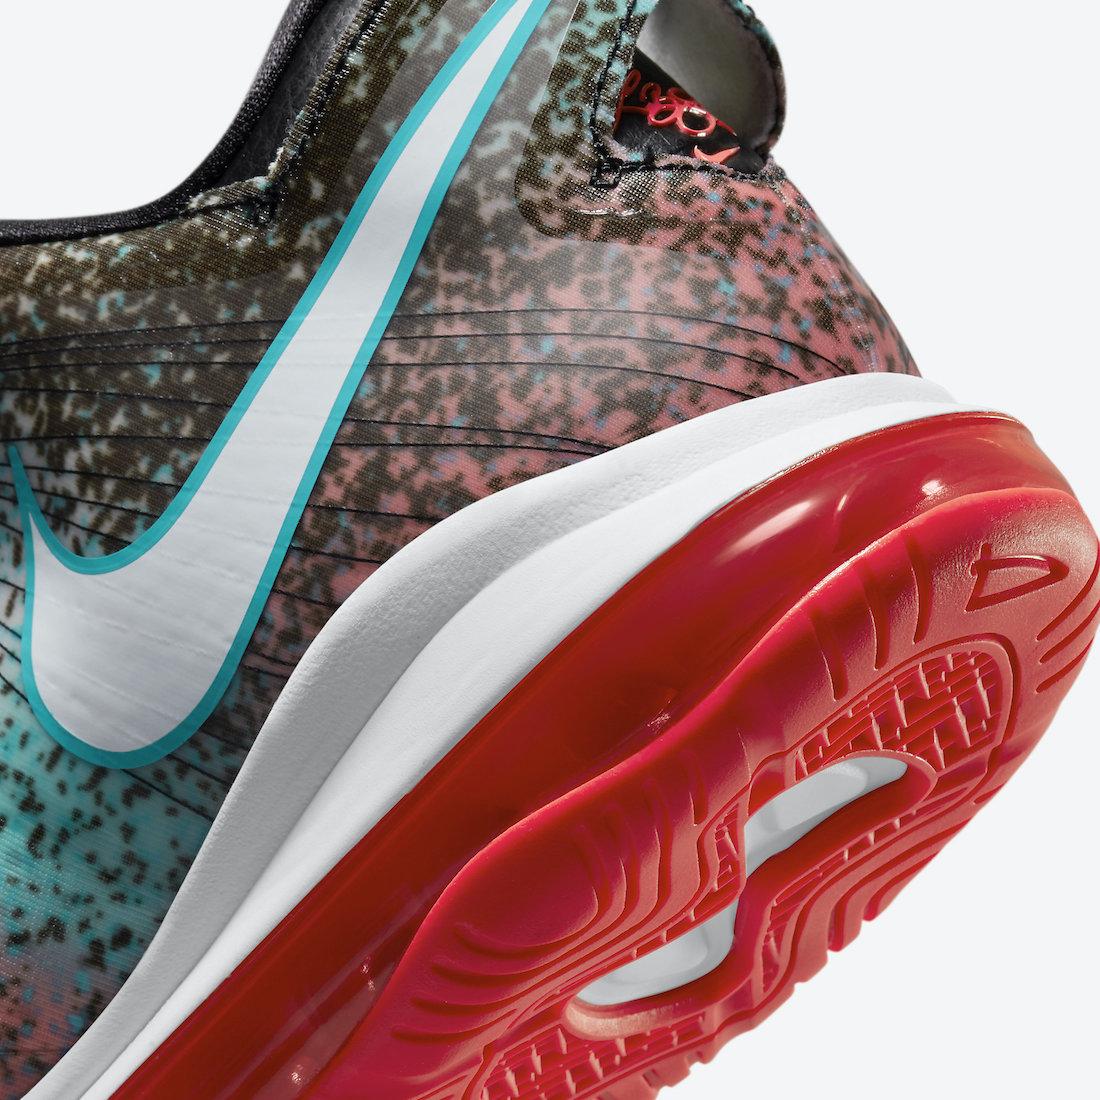 Nike-LeBron-8-V2-Low-Miami-Nights-DJ4436-100-Release-Date-7